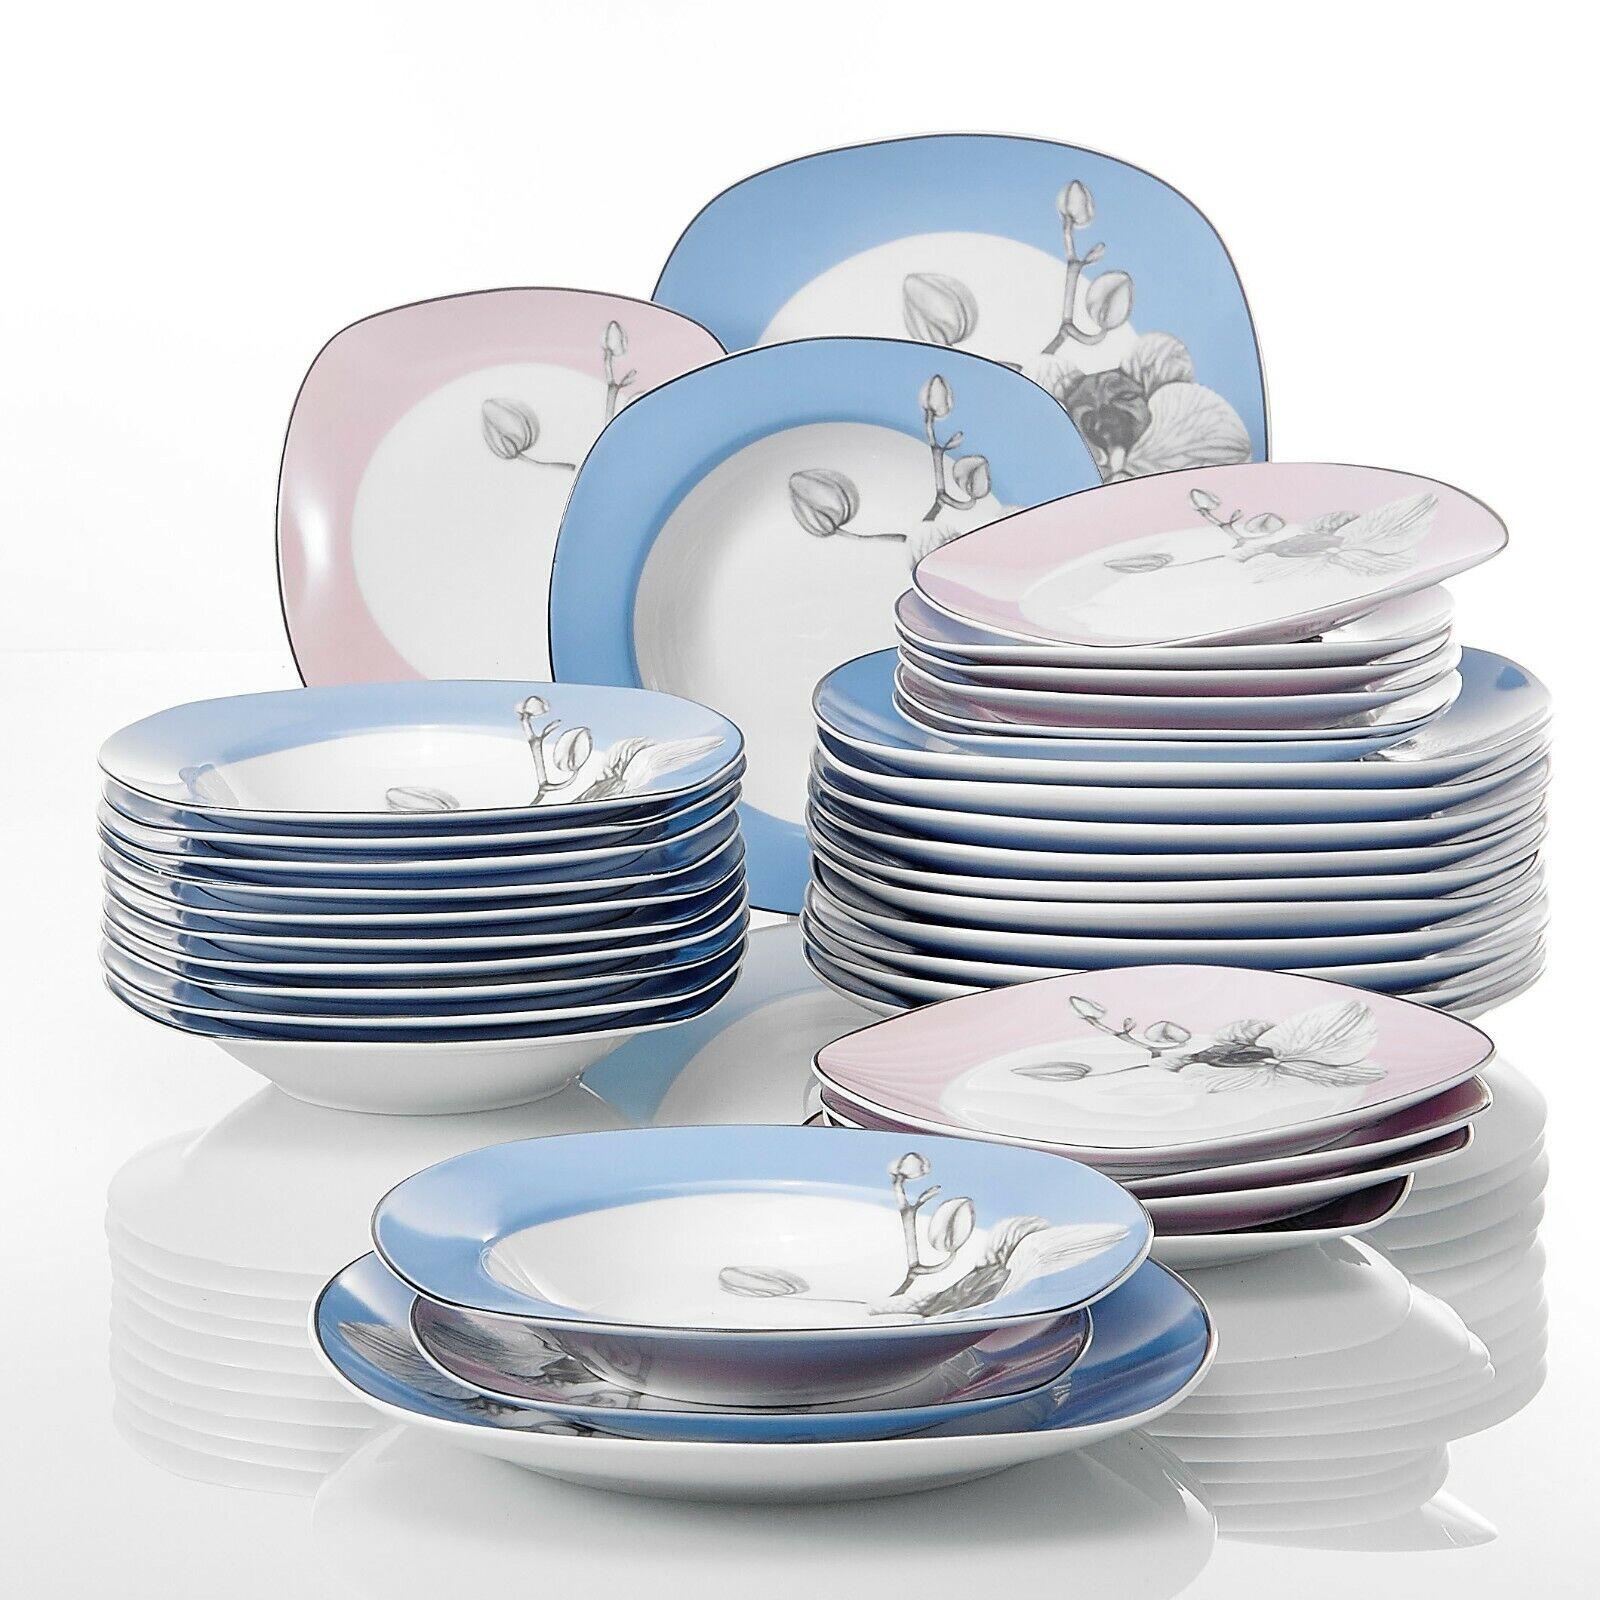 VEWEET Tafelservice 'Debbie' Porzellan 36 teilig Tellerset Tellerset Tellerset für 12 Personen | Luxus  15ee58